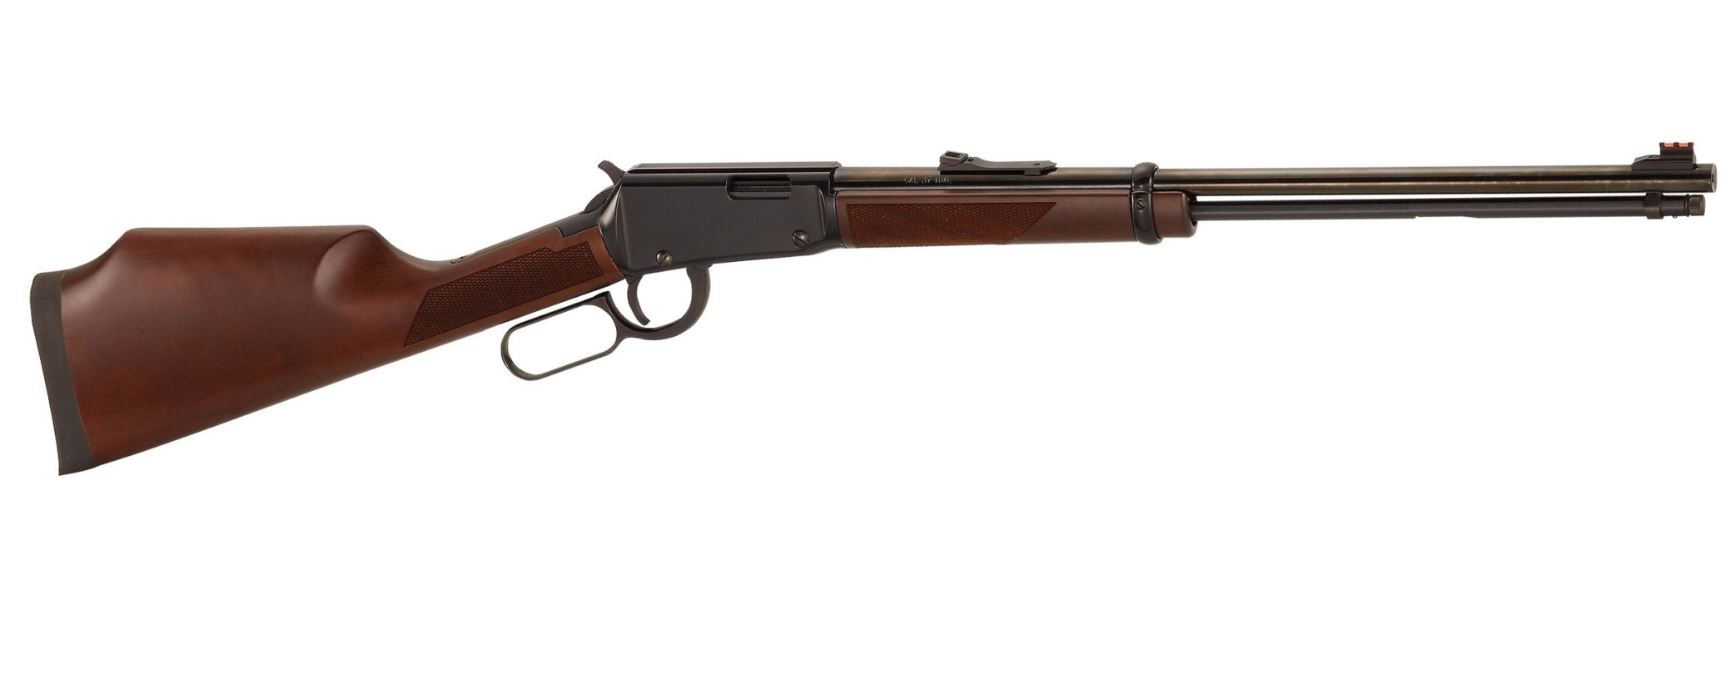 Henry Repeating Arms VARMINT EXPRESS 17 HMR